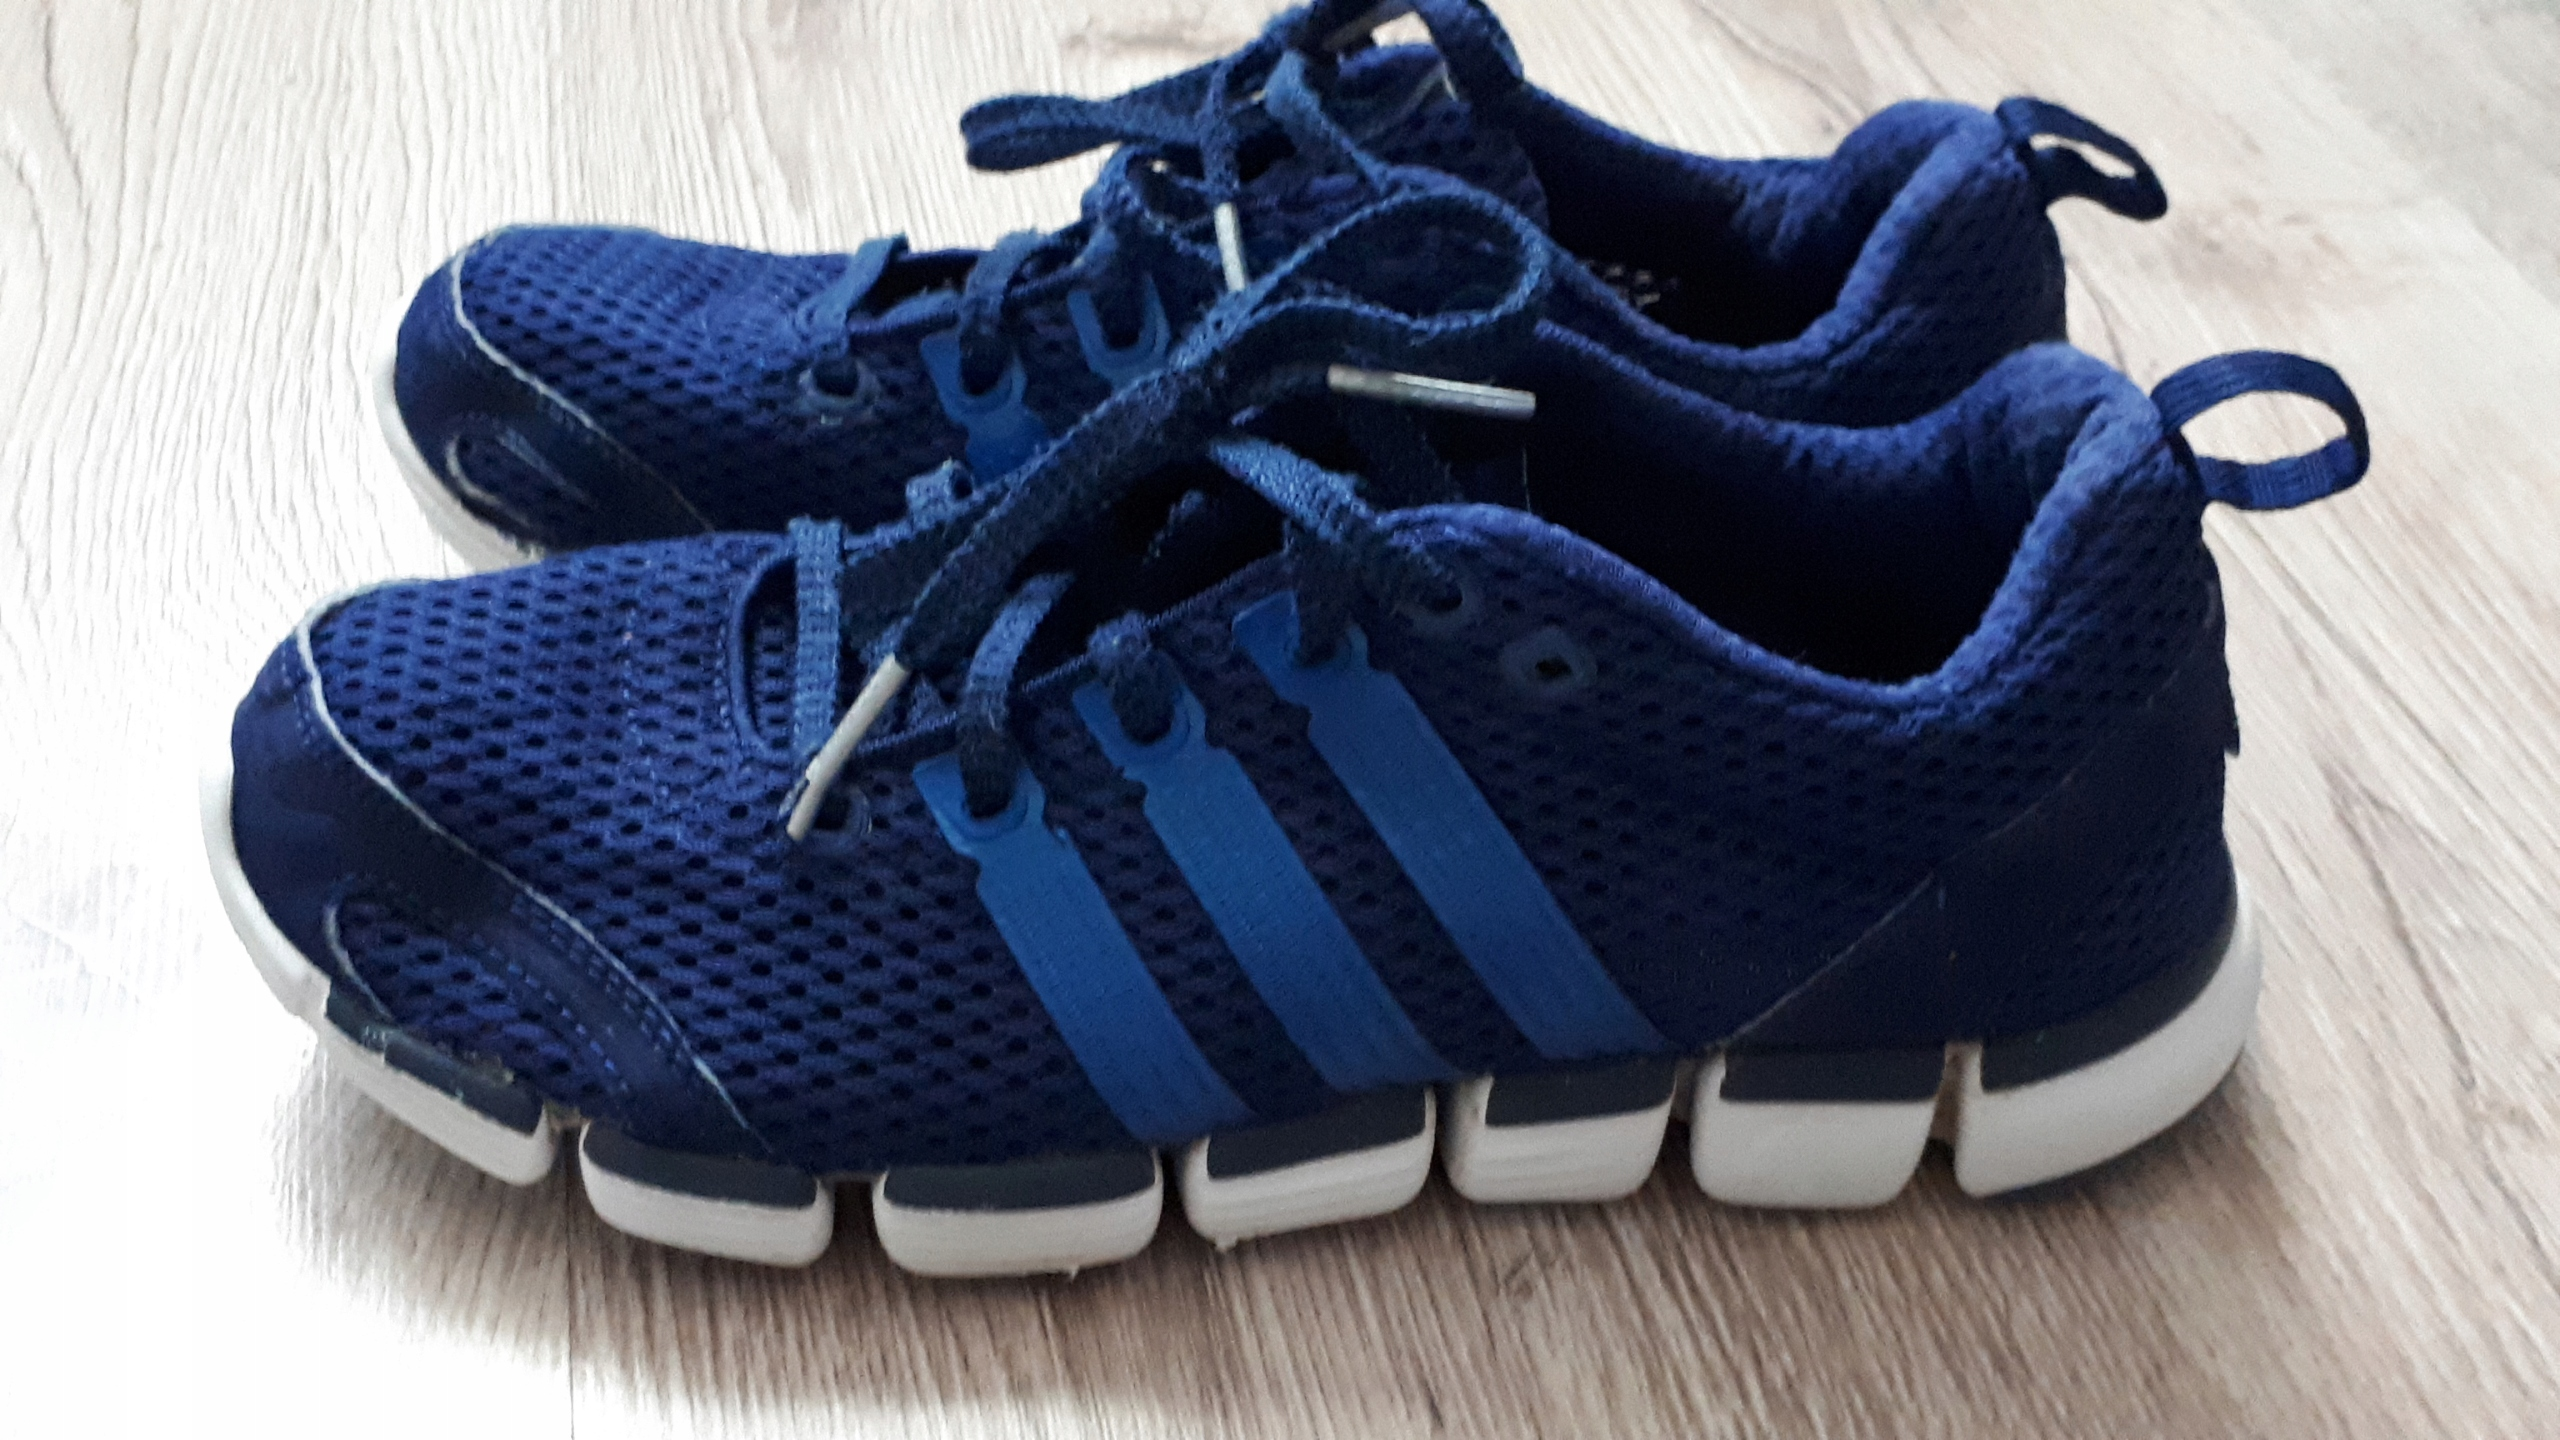 Adidas Climacool Ride Running Trainer r 38 w 24